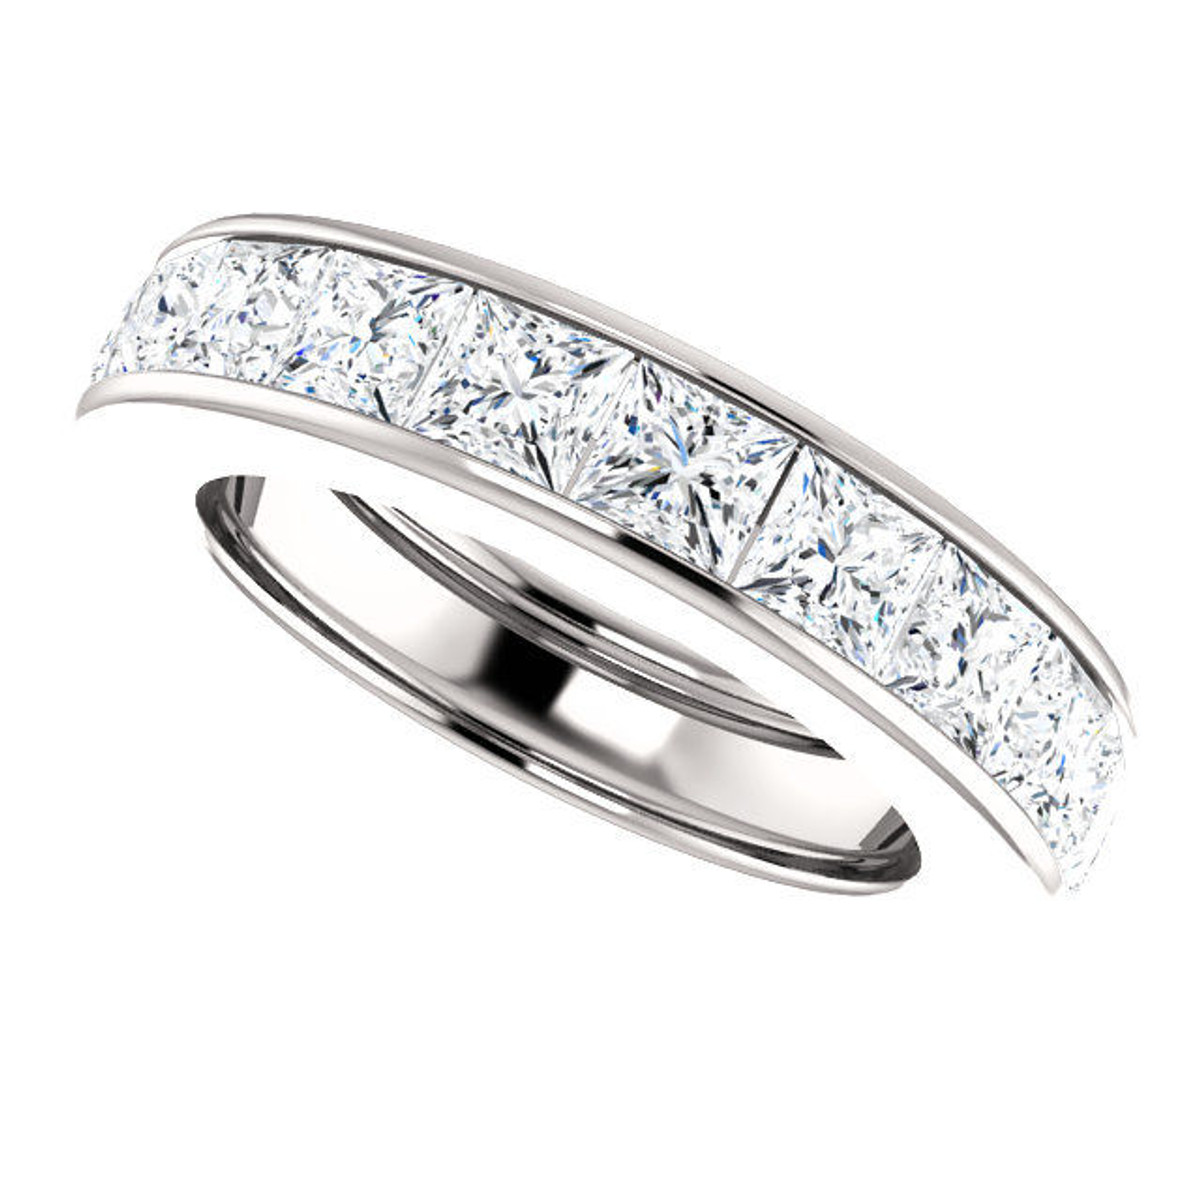 Platinum 4.6 ct tw Princess Cut Diamond Eternity Ring